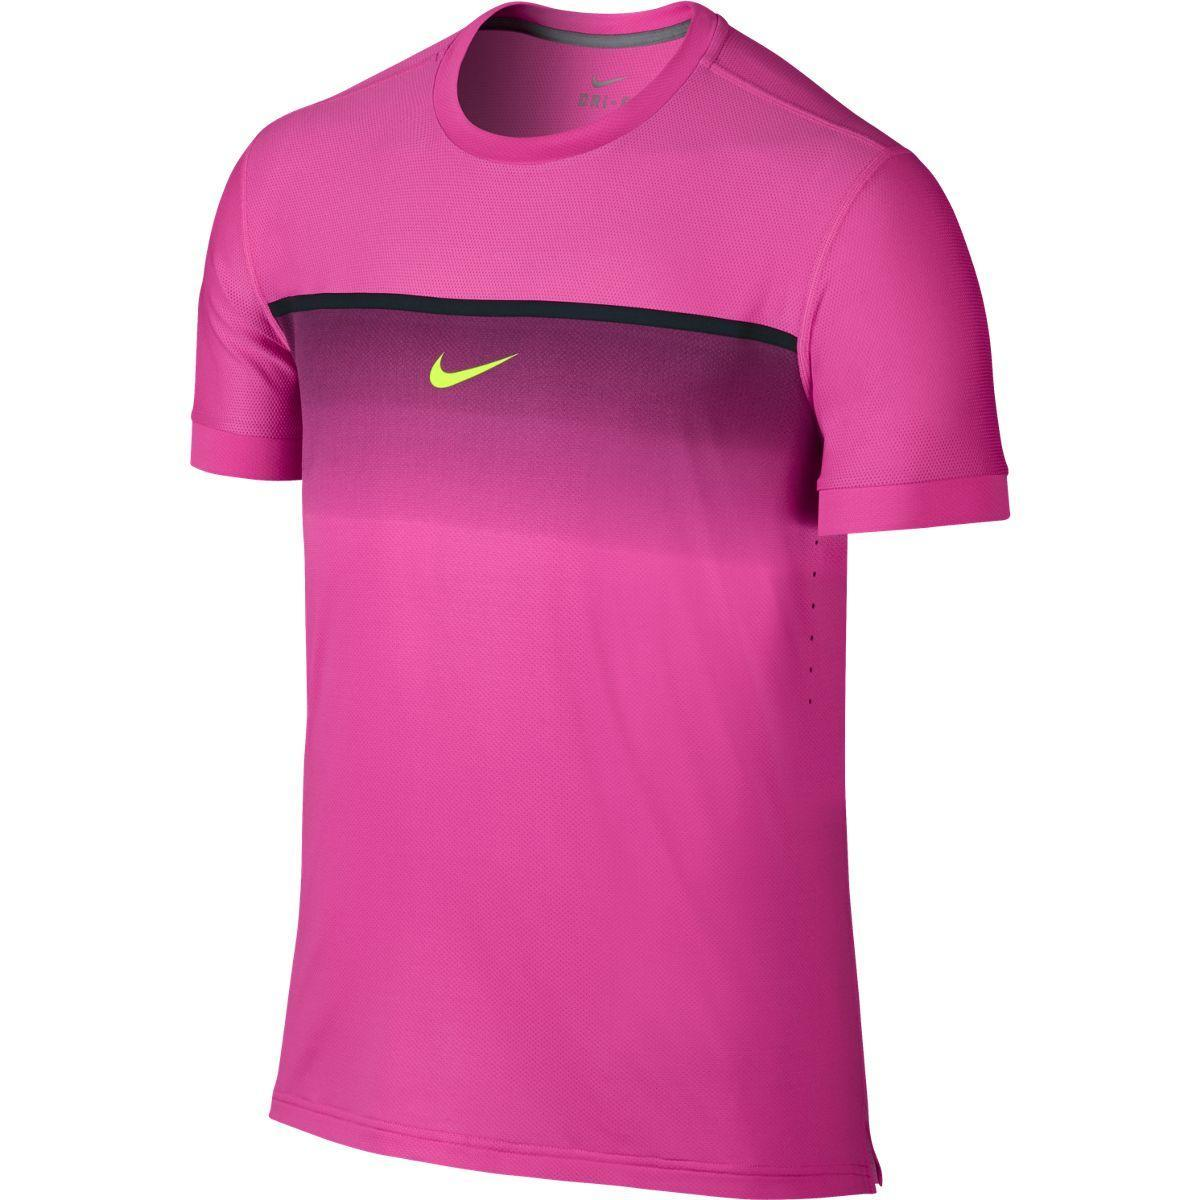 new products bc2ac 24727 Nike Mens Challenger Premier Rafa Crew - Pink PowVolt - Tenn